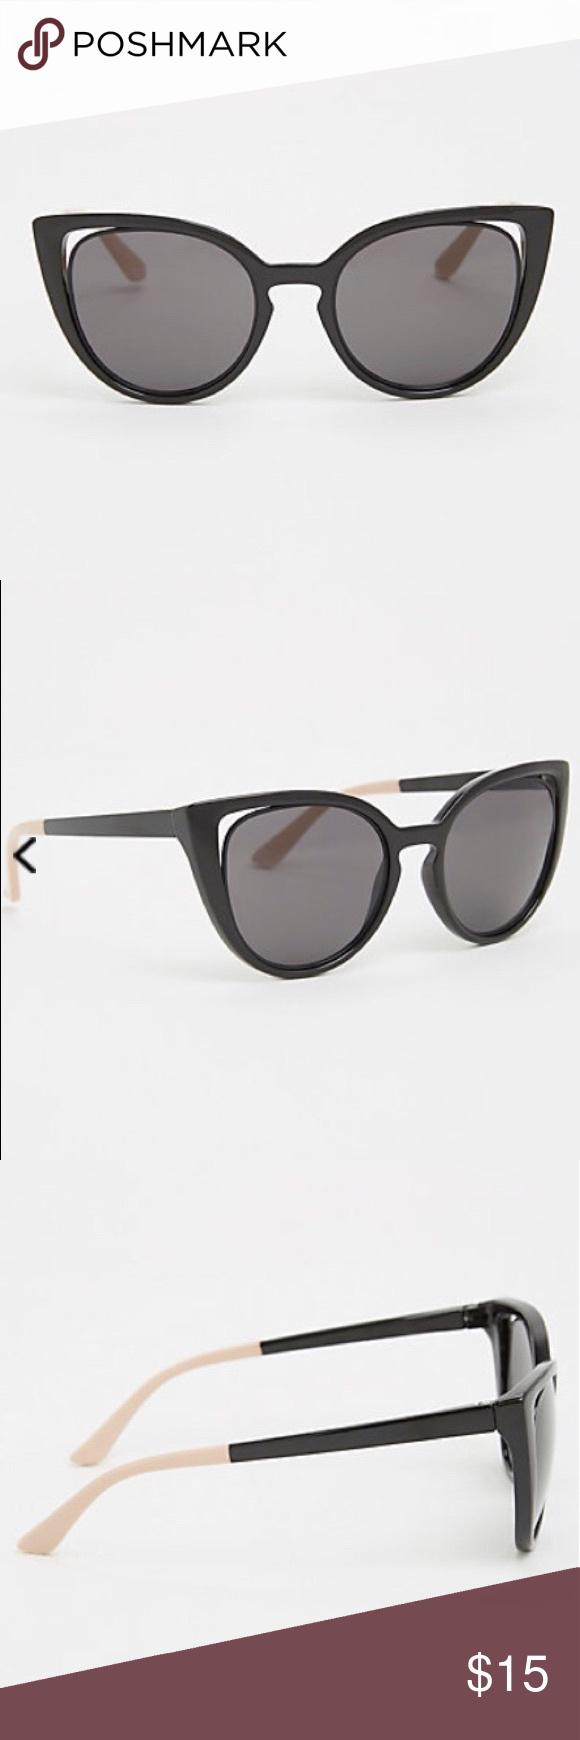 efada2fc9deb5 🐾 Cut out cateye sunglasses